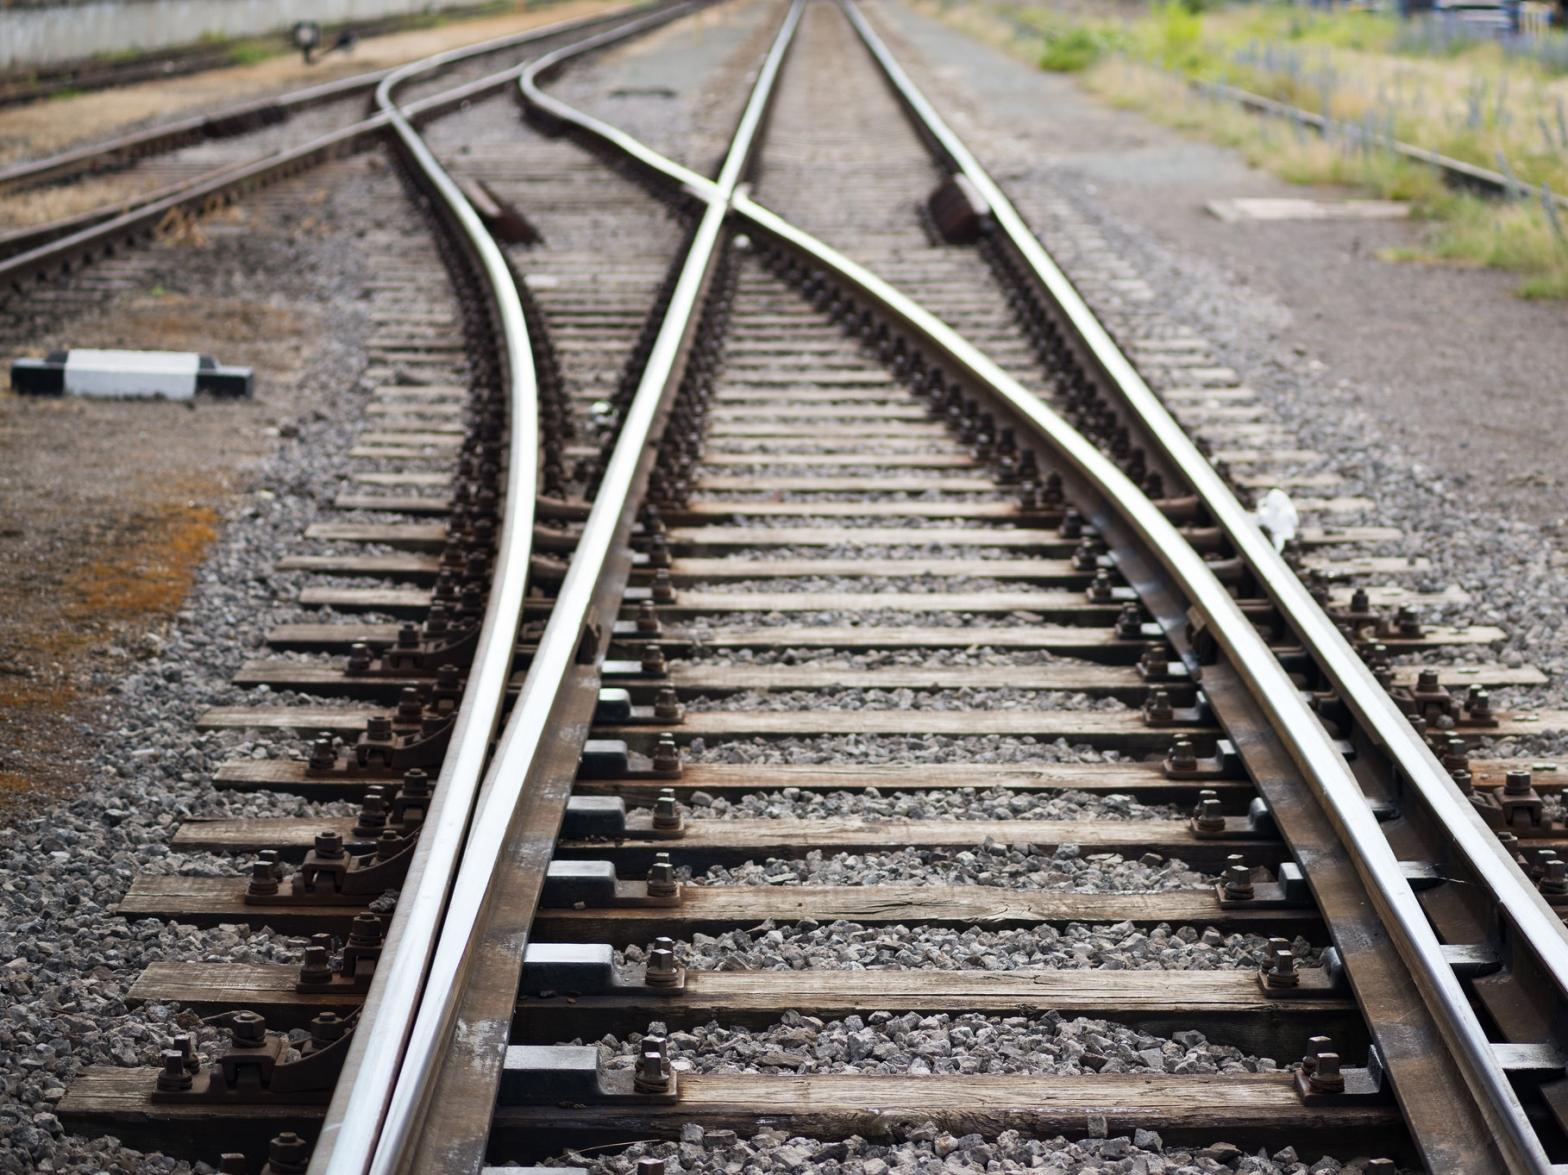 Railway Switch Photo Rainer Stropek. Flickr.com (CC BY 2.0)